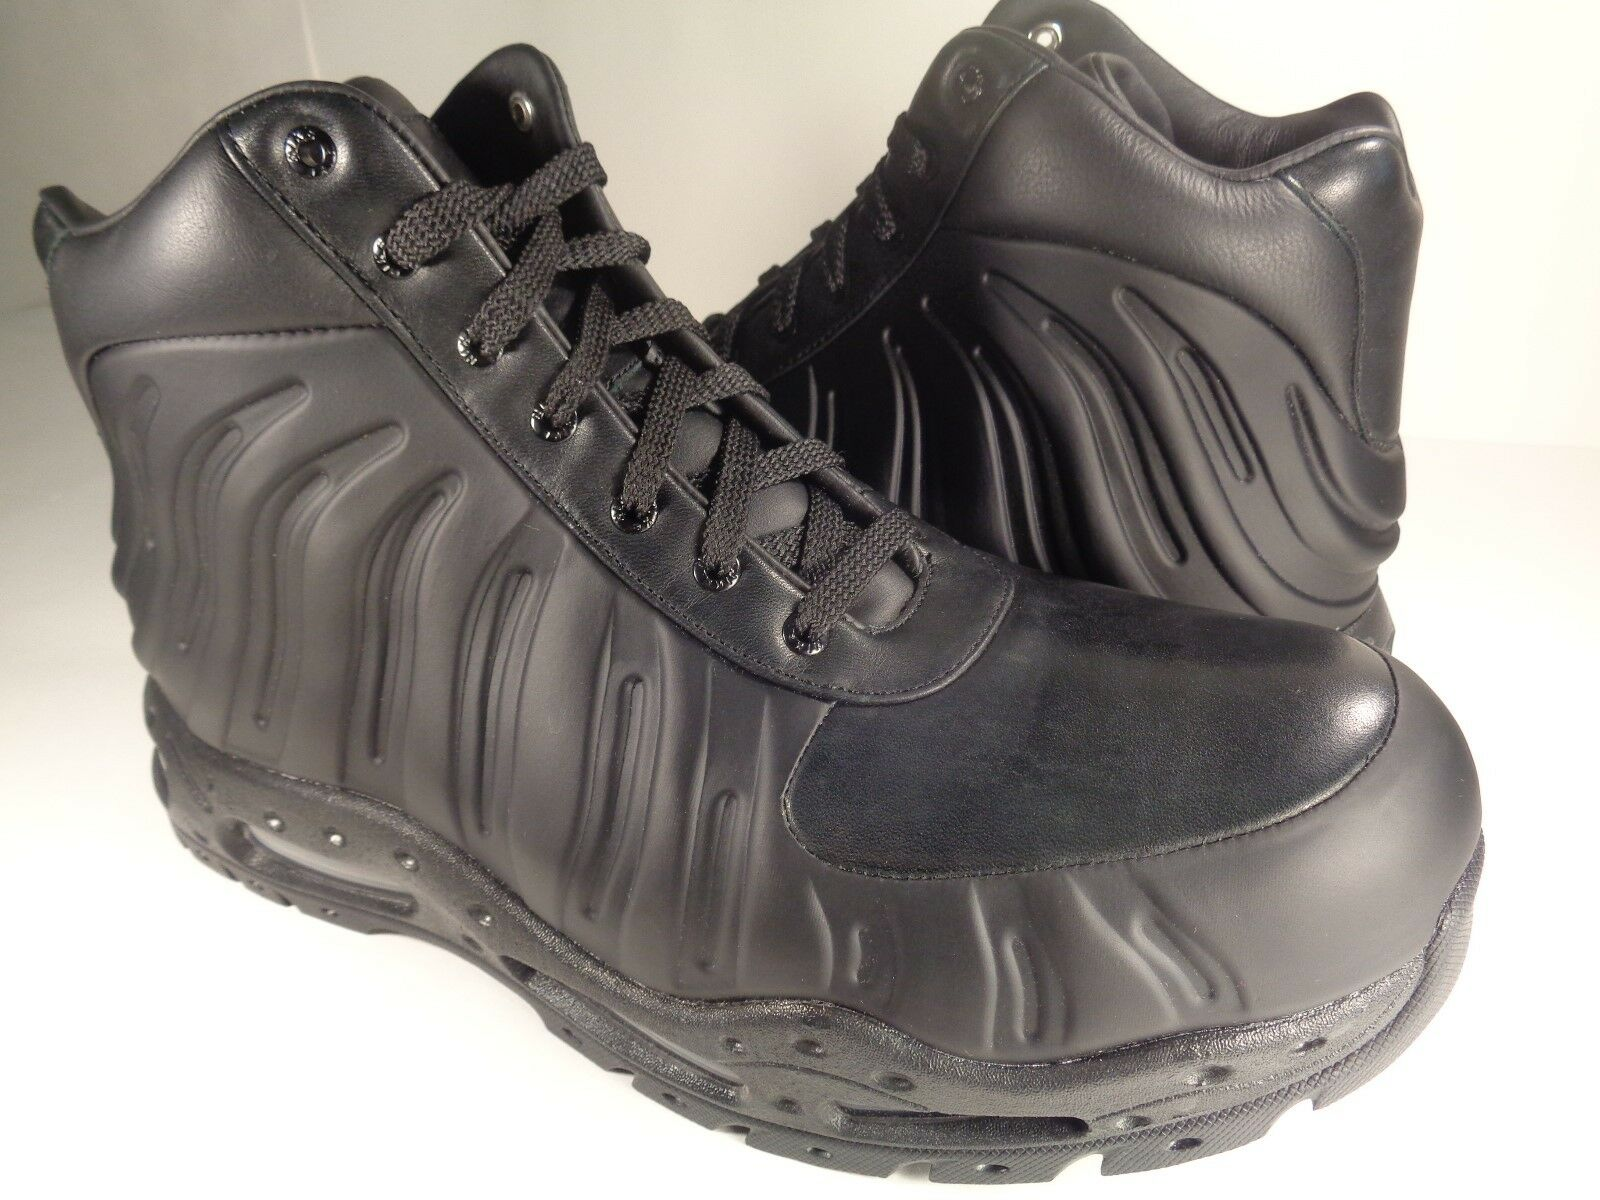 Nike Air Max Foamdome Foamposite Boots Black Triple Black SZ 9 (843749-002)